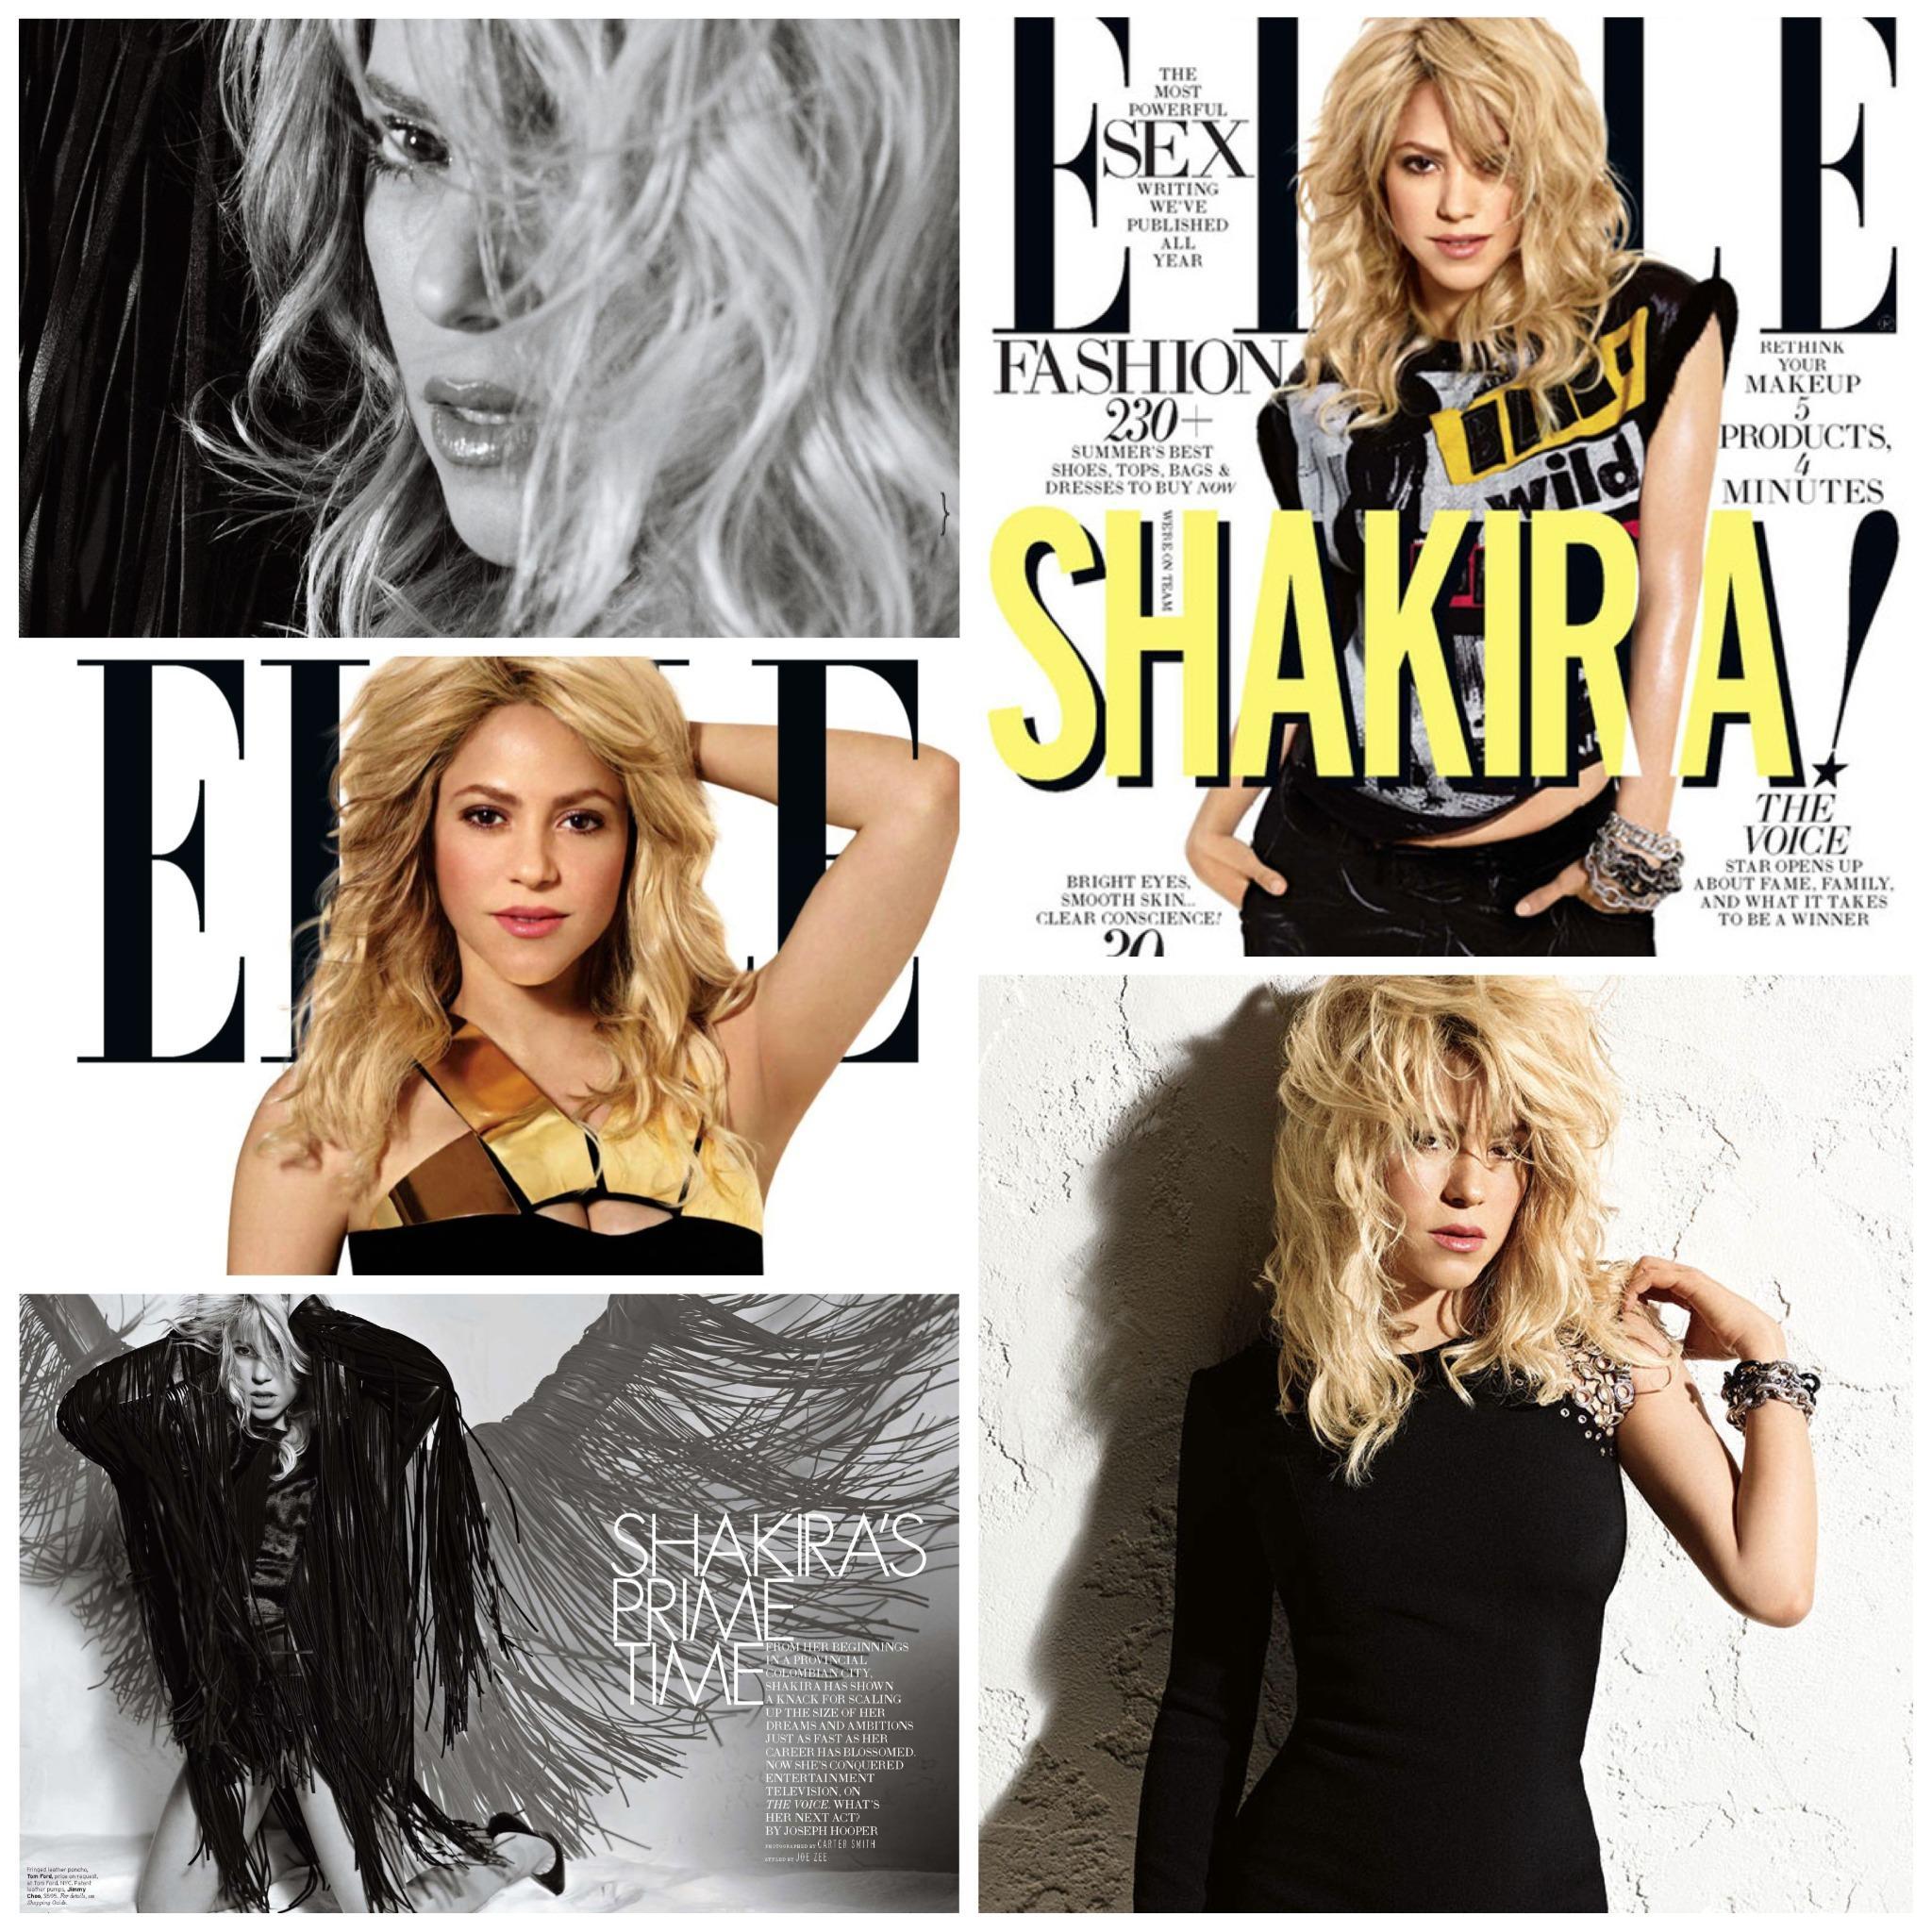 Summer 2013 @ElleMagazine cover #TBT / Verano 2013 en la revista #ELLE ShakHQ http://t.co/Y7XSV5fEOt